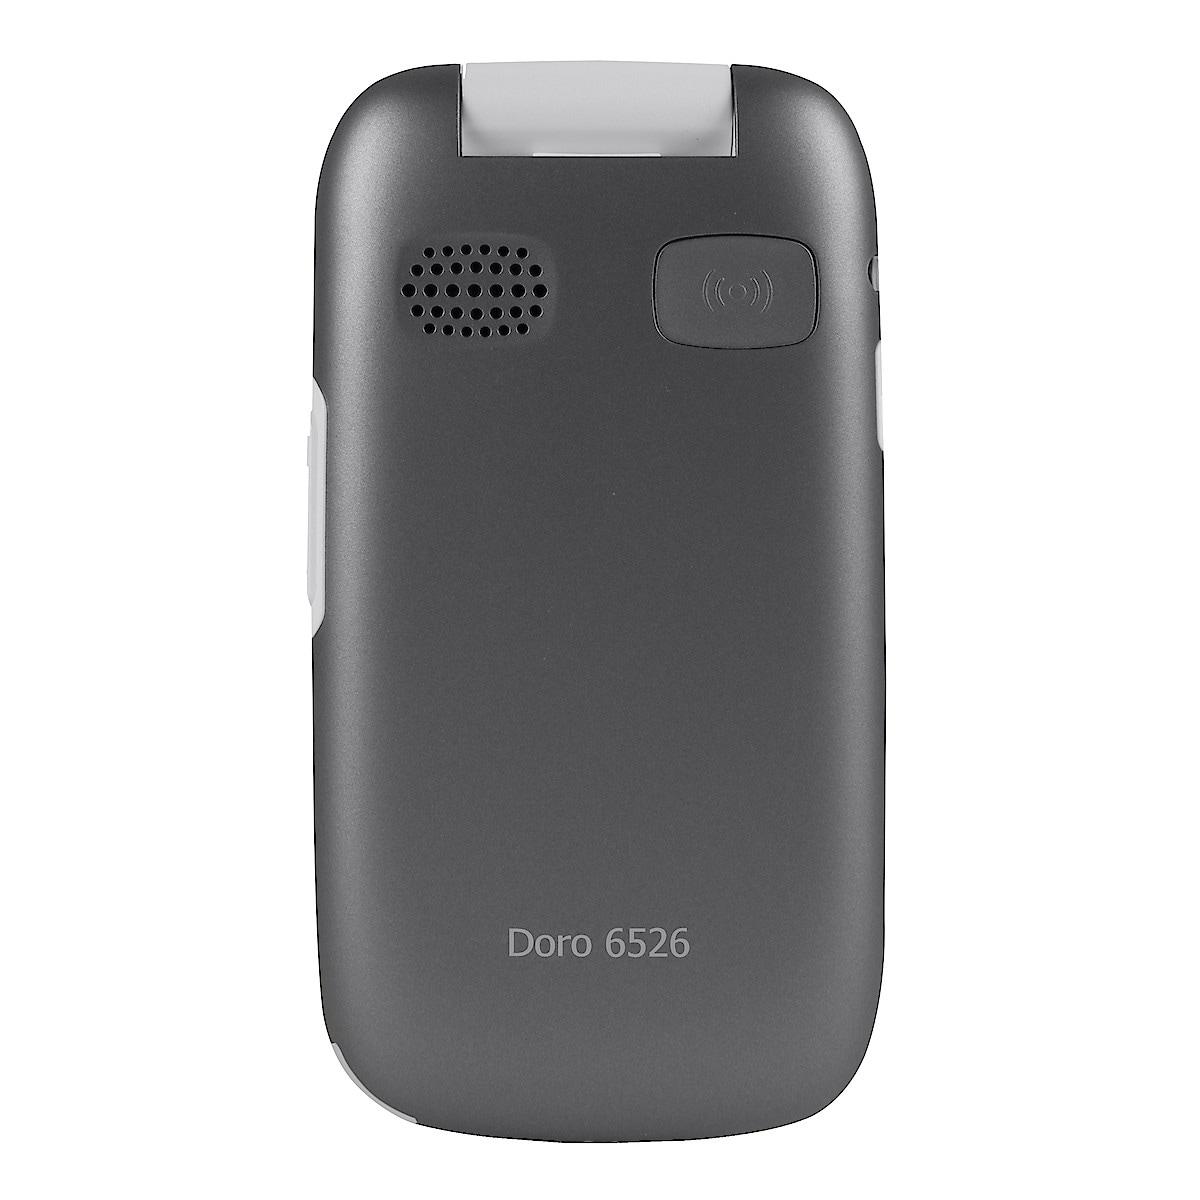 Doro 6526 mobiltelefon